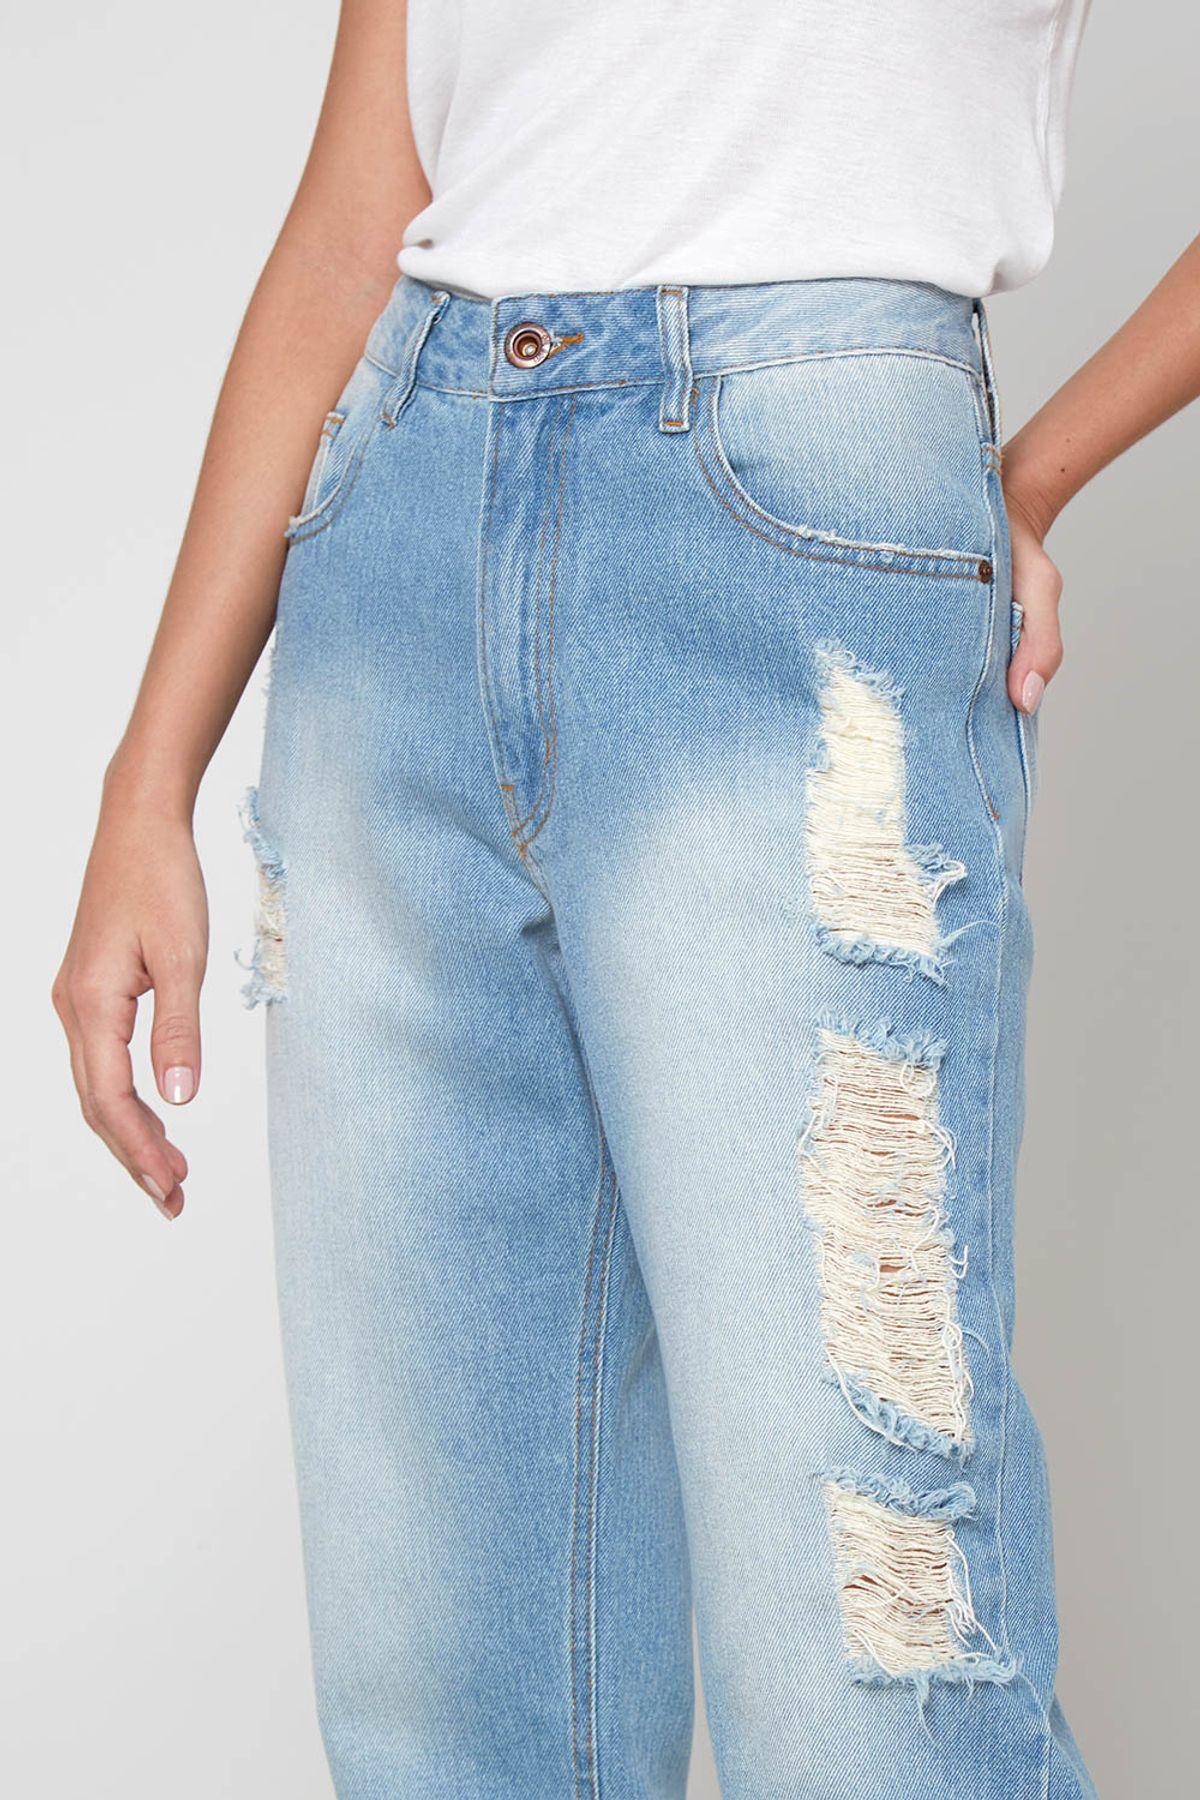 calça jeans detonada estilo rock